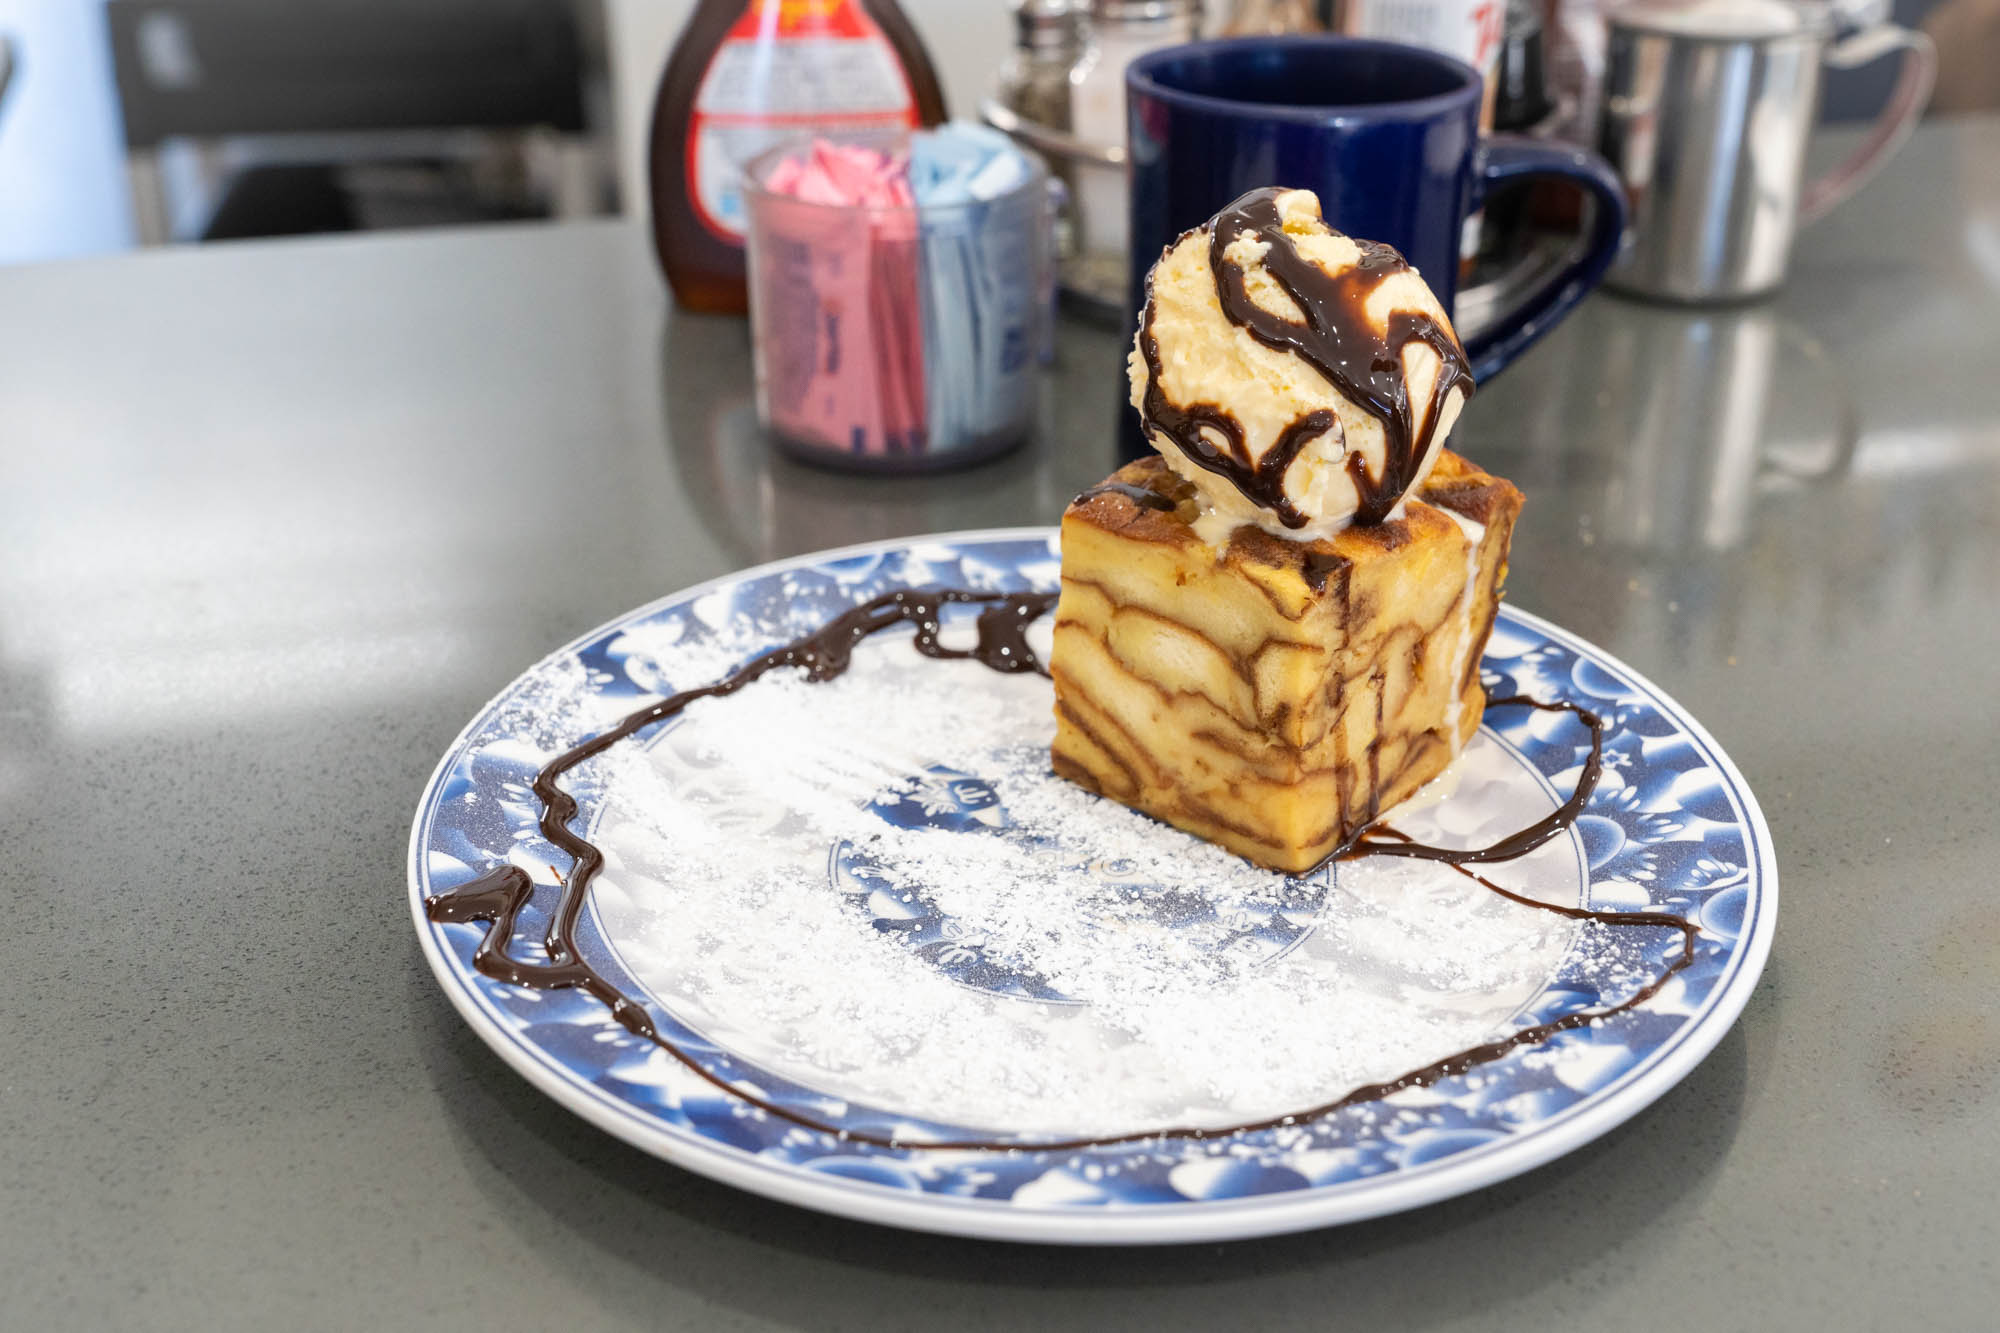 Pineapple Bread Pudding with vanilla ice cream